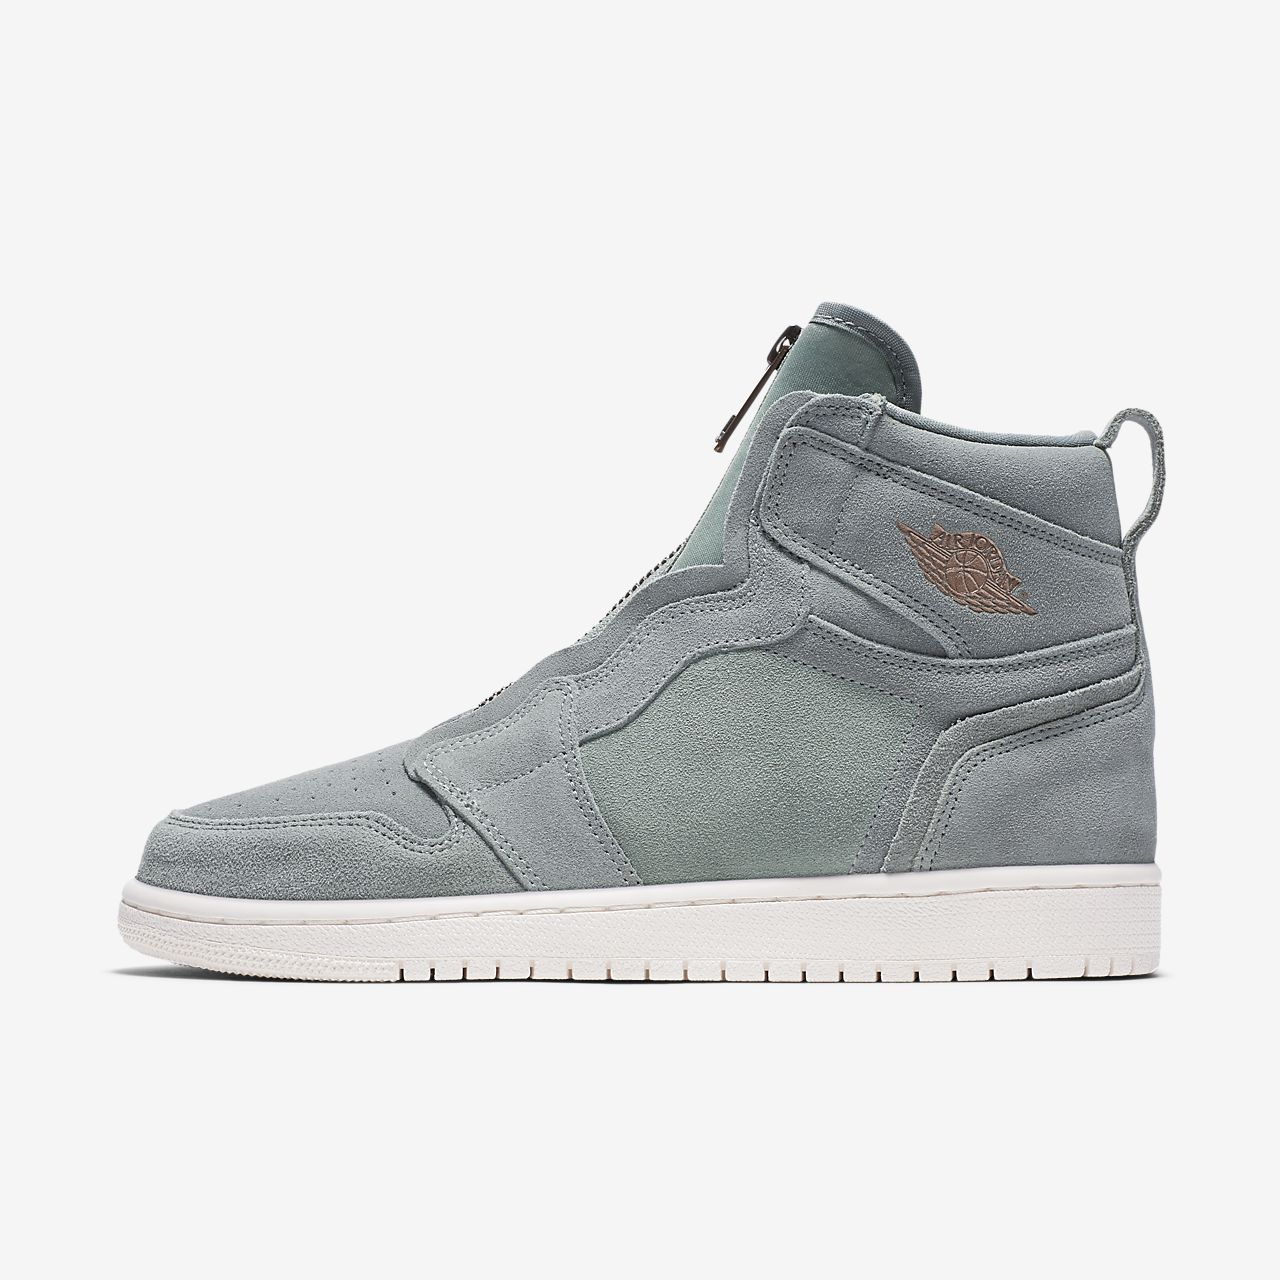 Calzado para mujer Air Jordan 1 High Zip